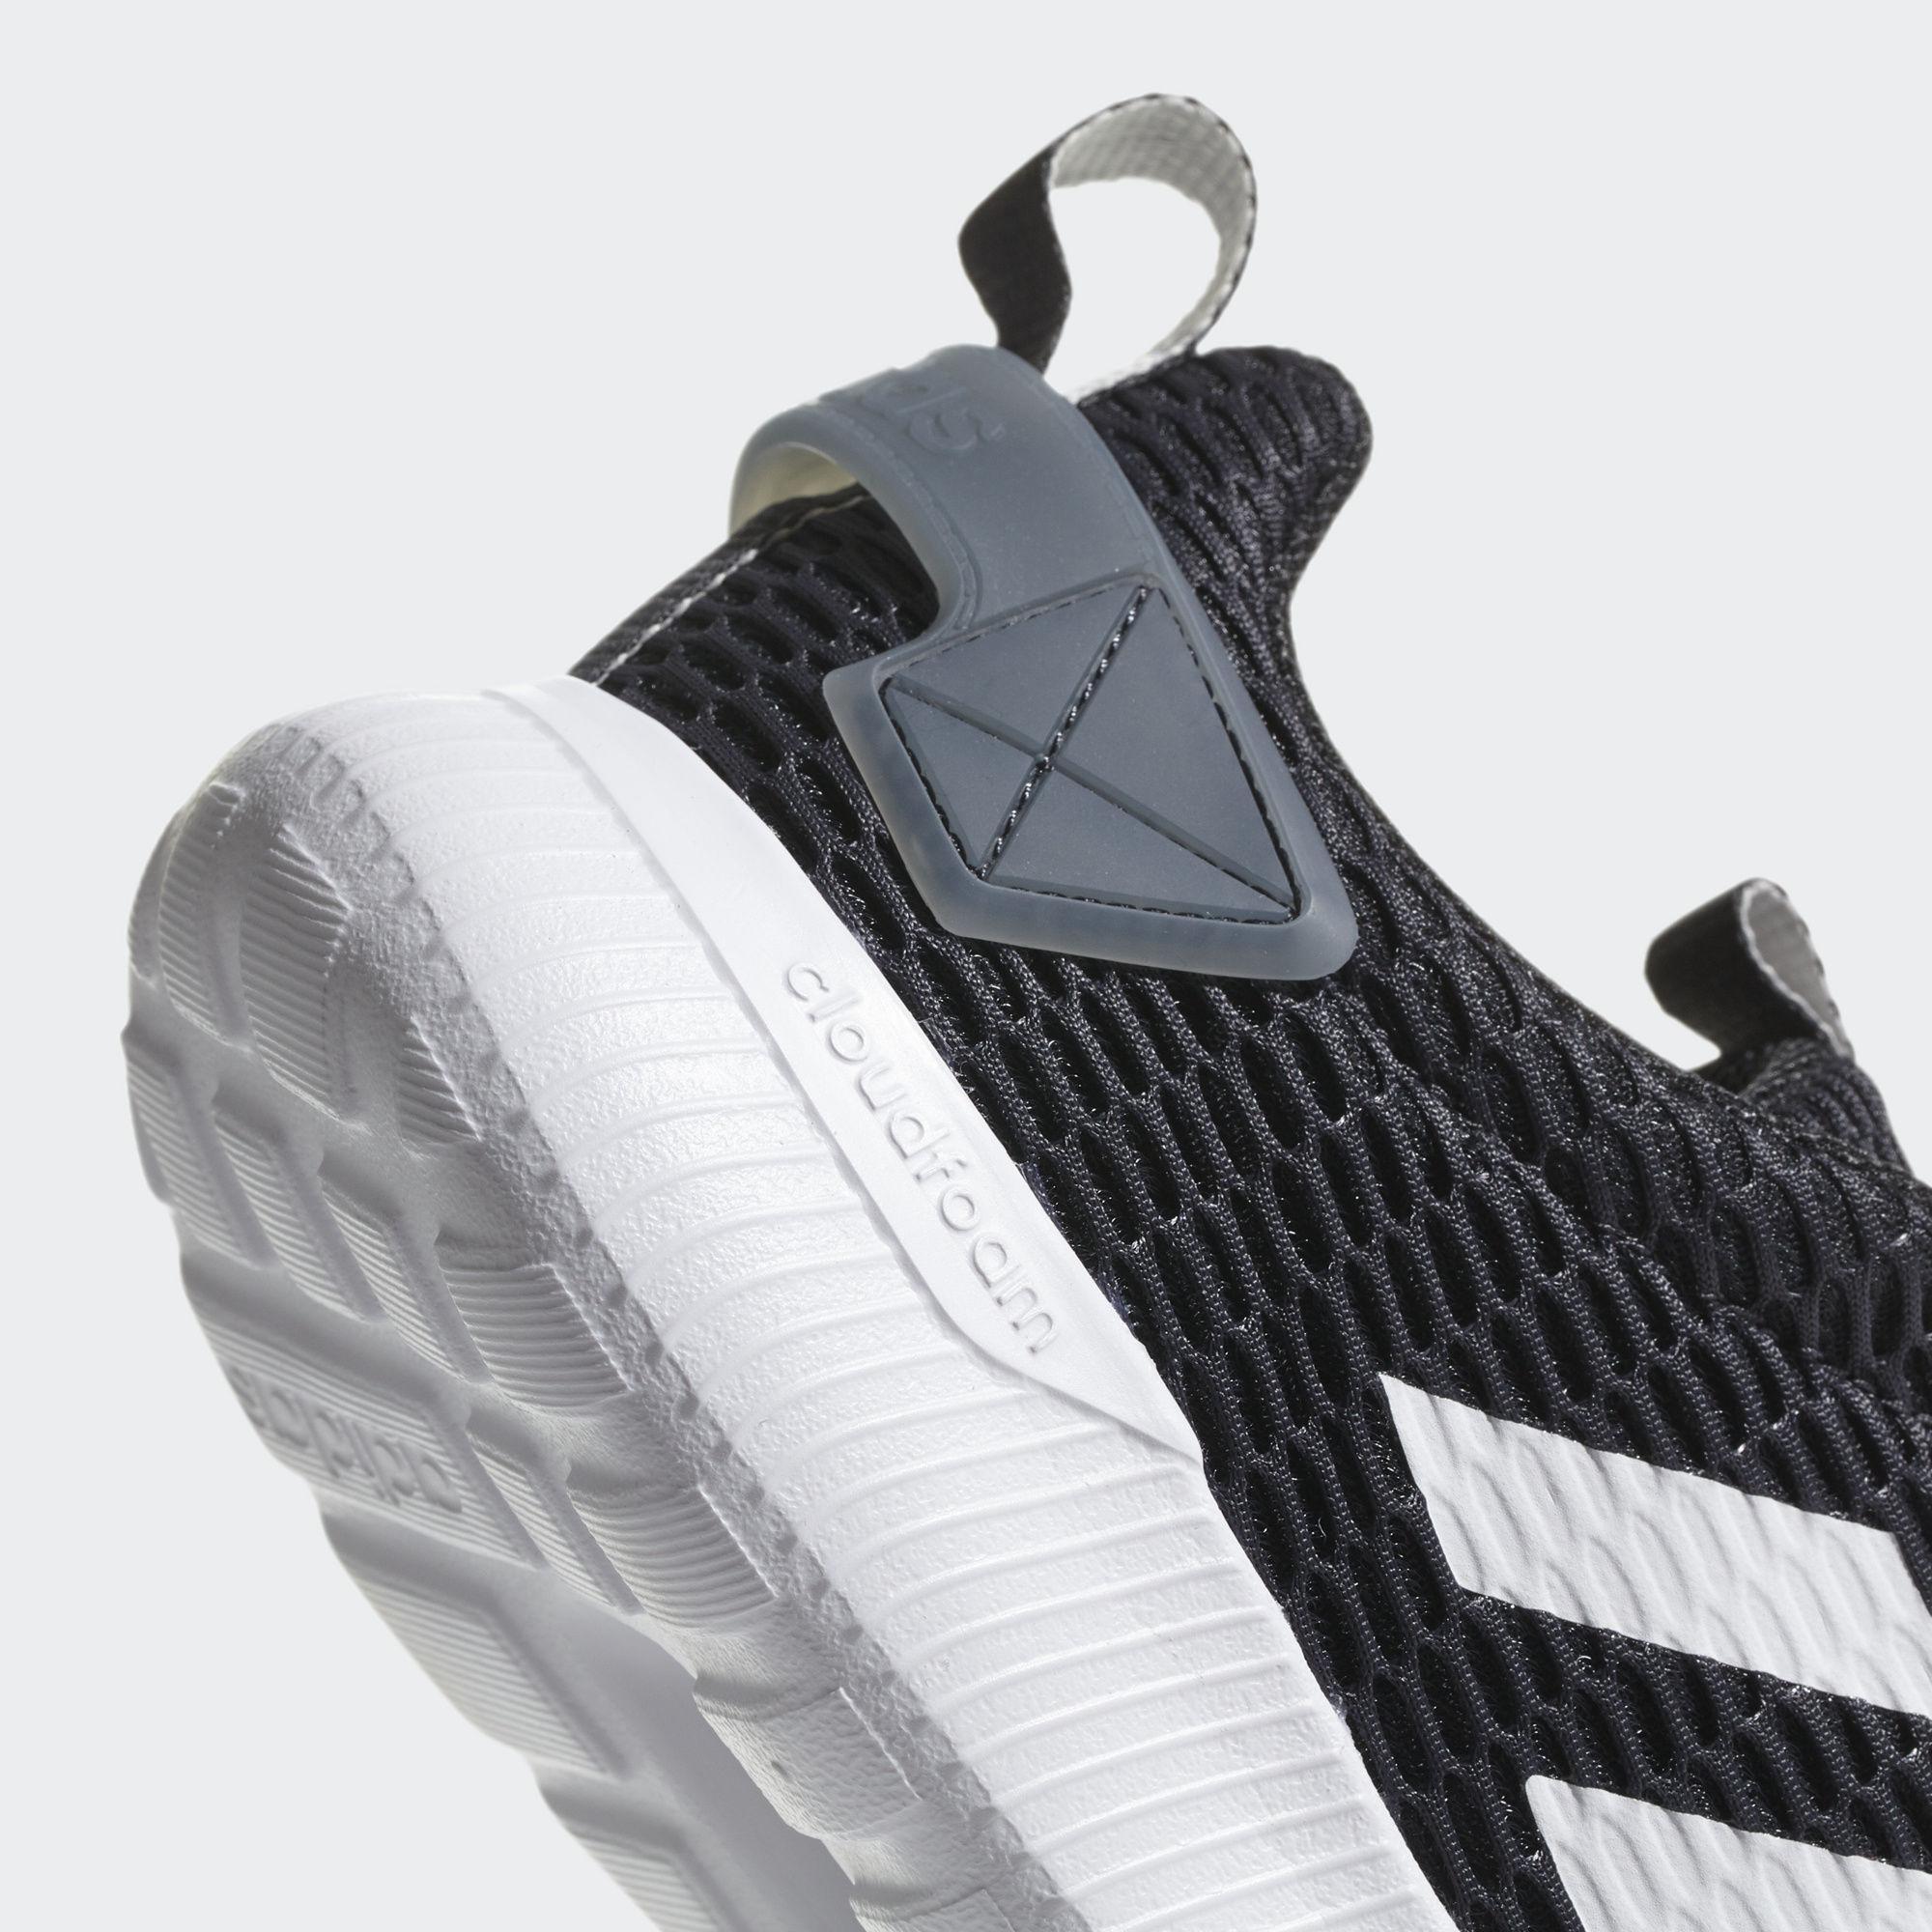 ... Adidas Sepatu running Cloudfoam Lite Racer Climacool - DB1590 - hitam - 4